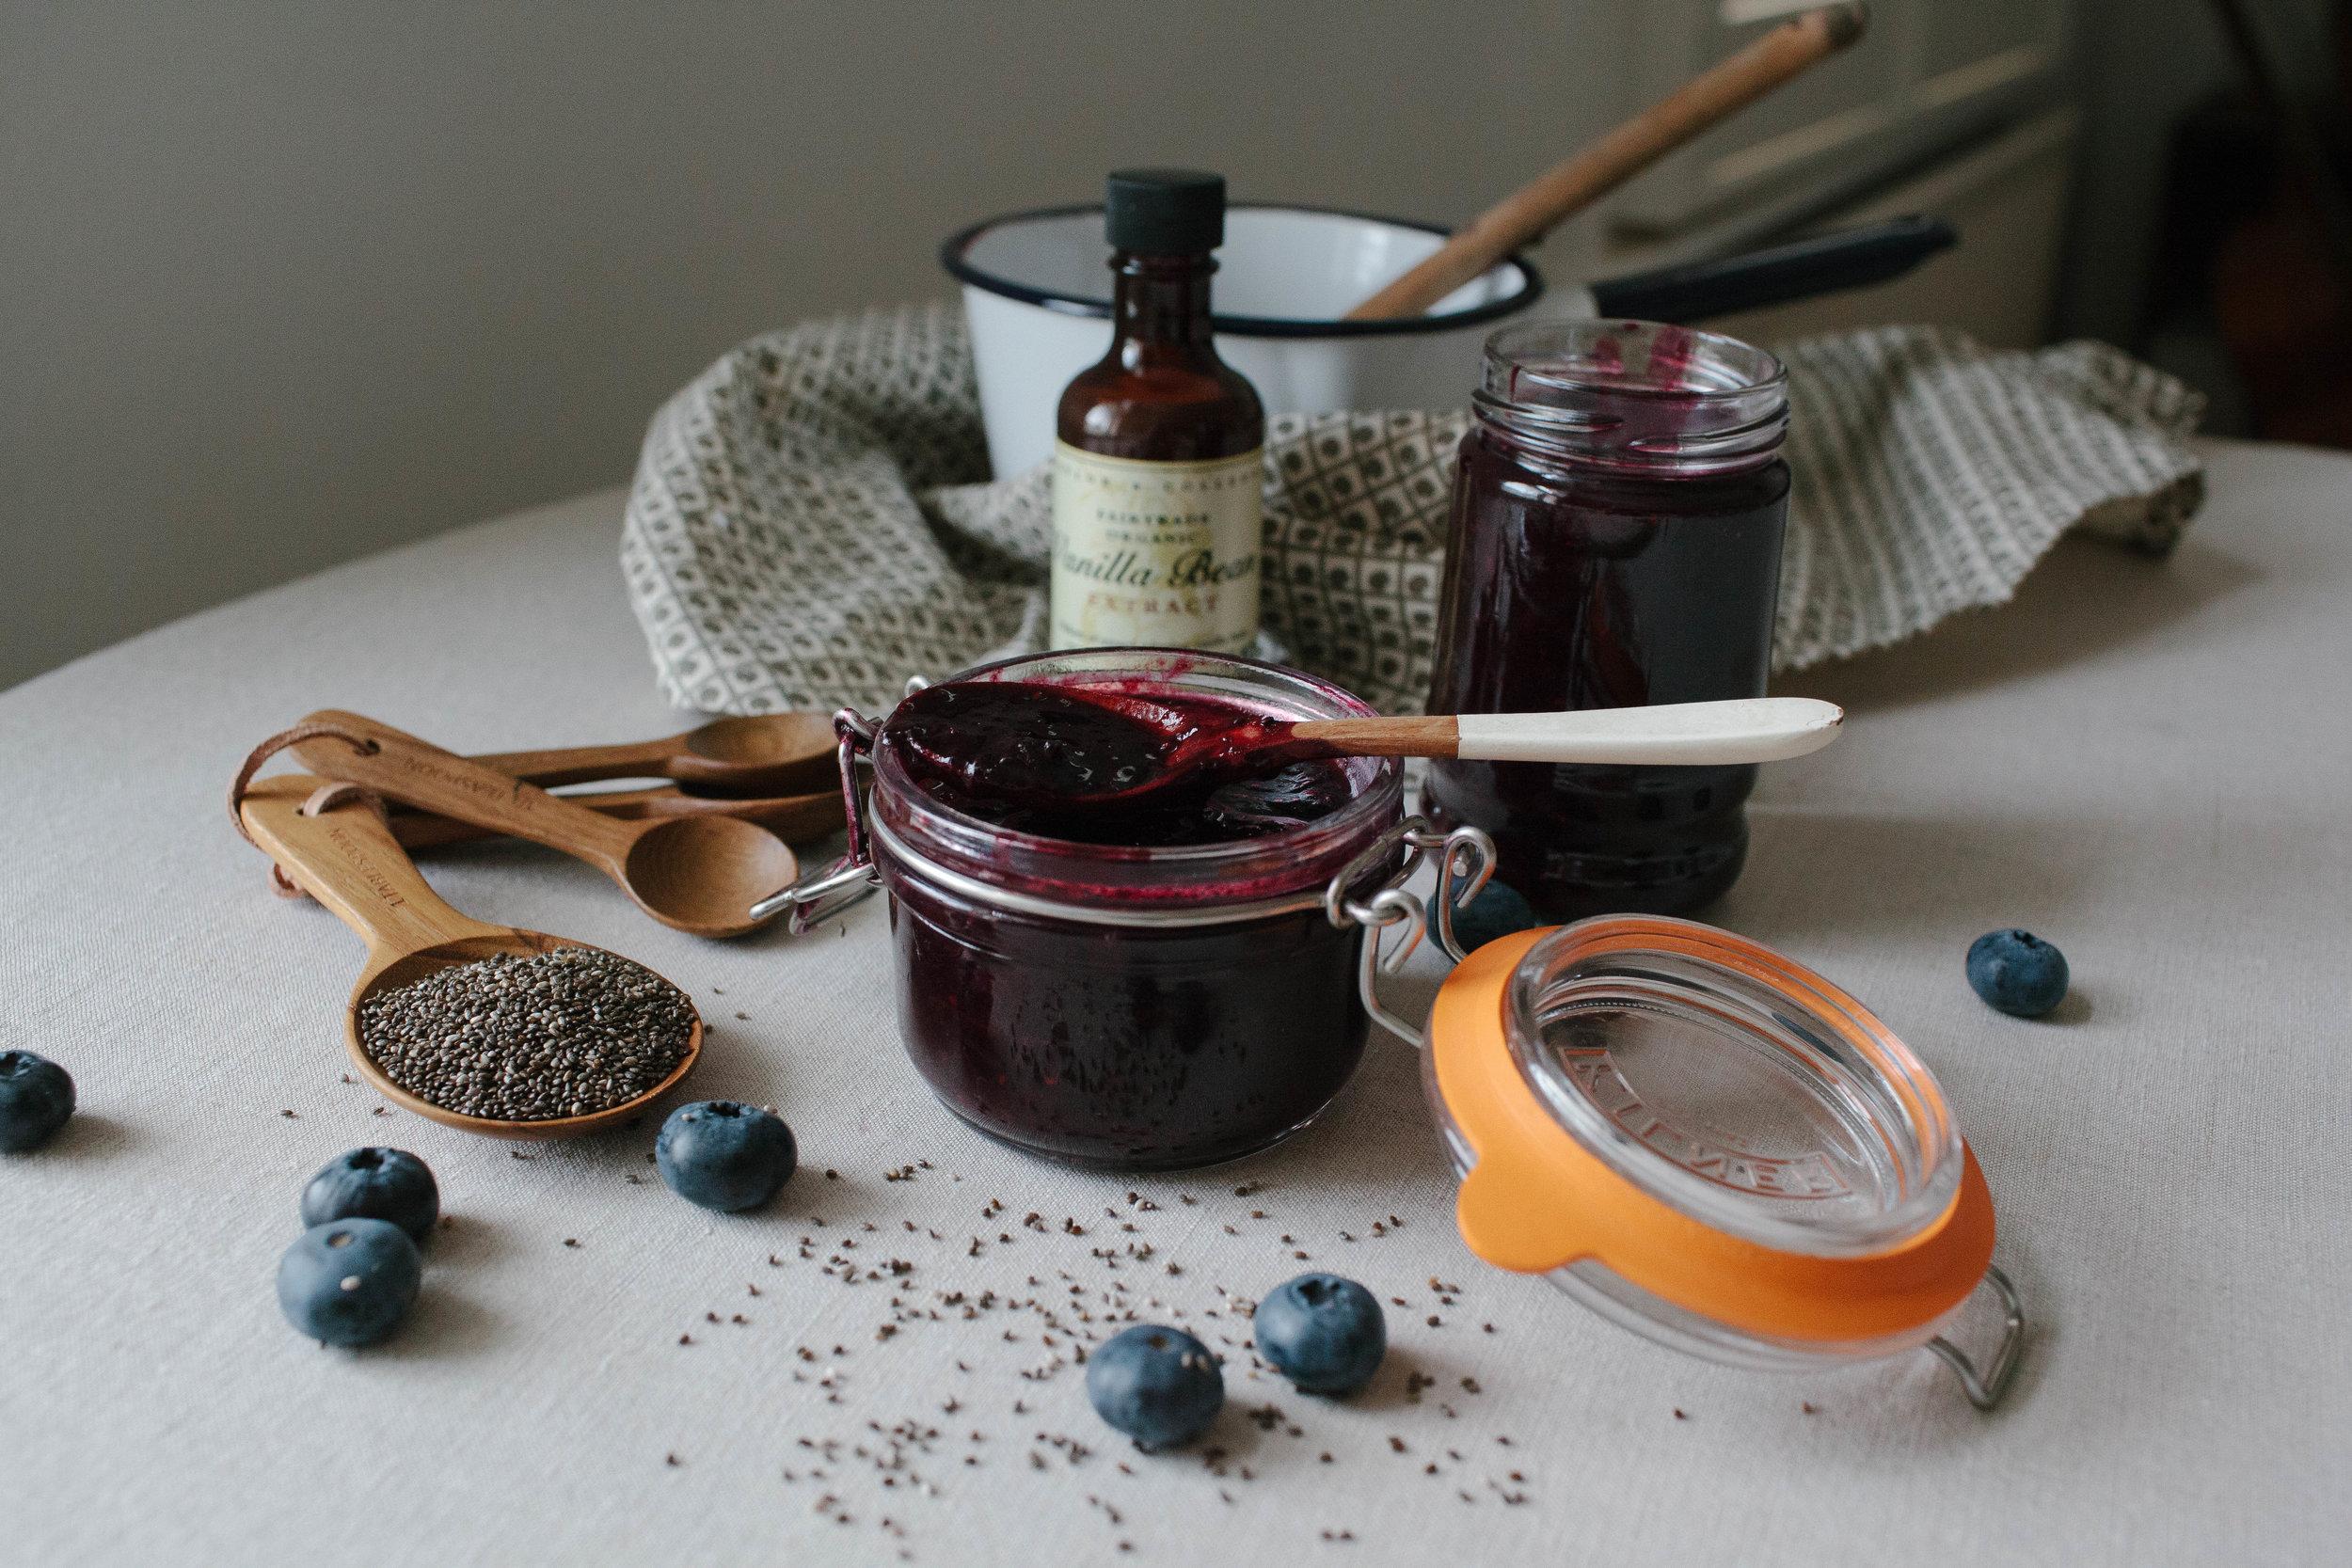 blueberry-vanilla-chia-jam-6.jpg